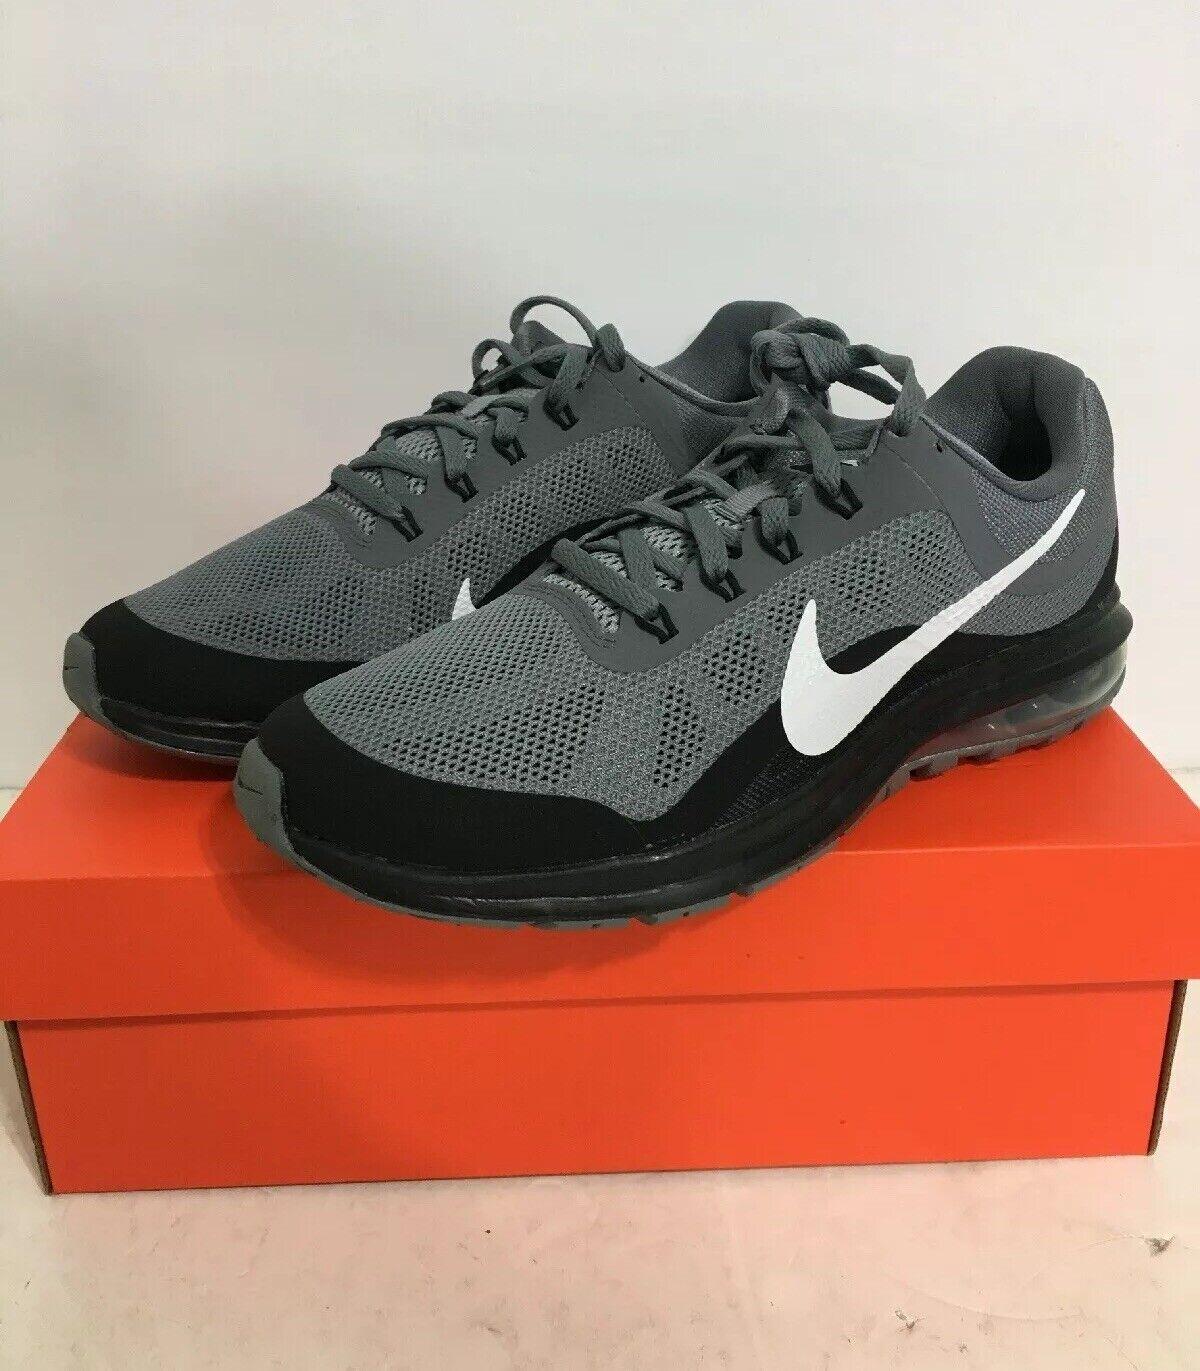 Nike Air Max Dynasty 2 Running Mens shoes Cool Grey Black 852430-006 Sz 9